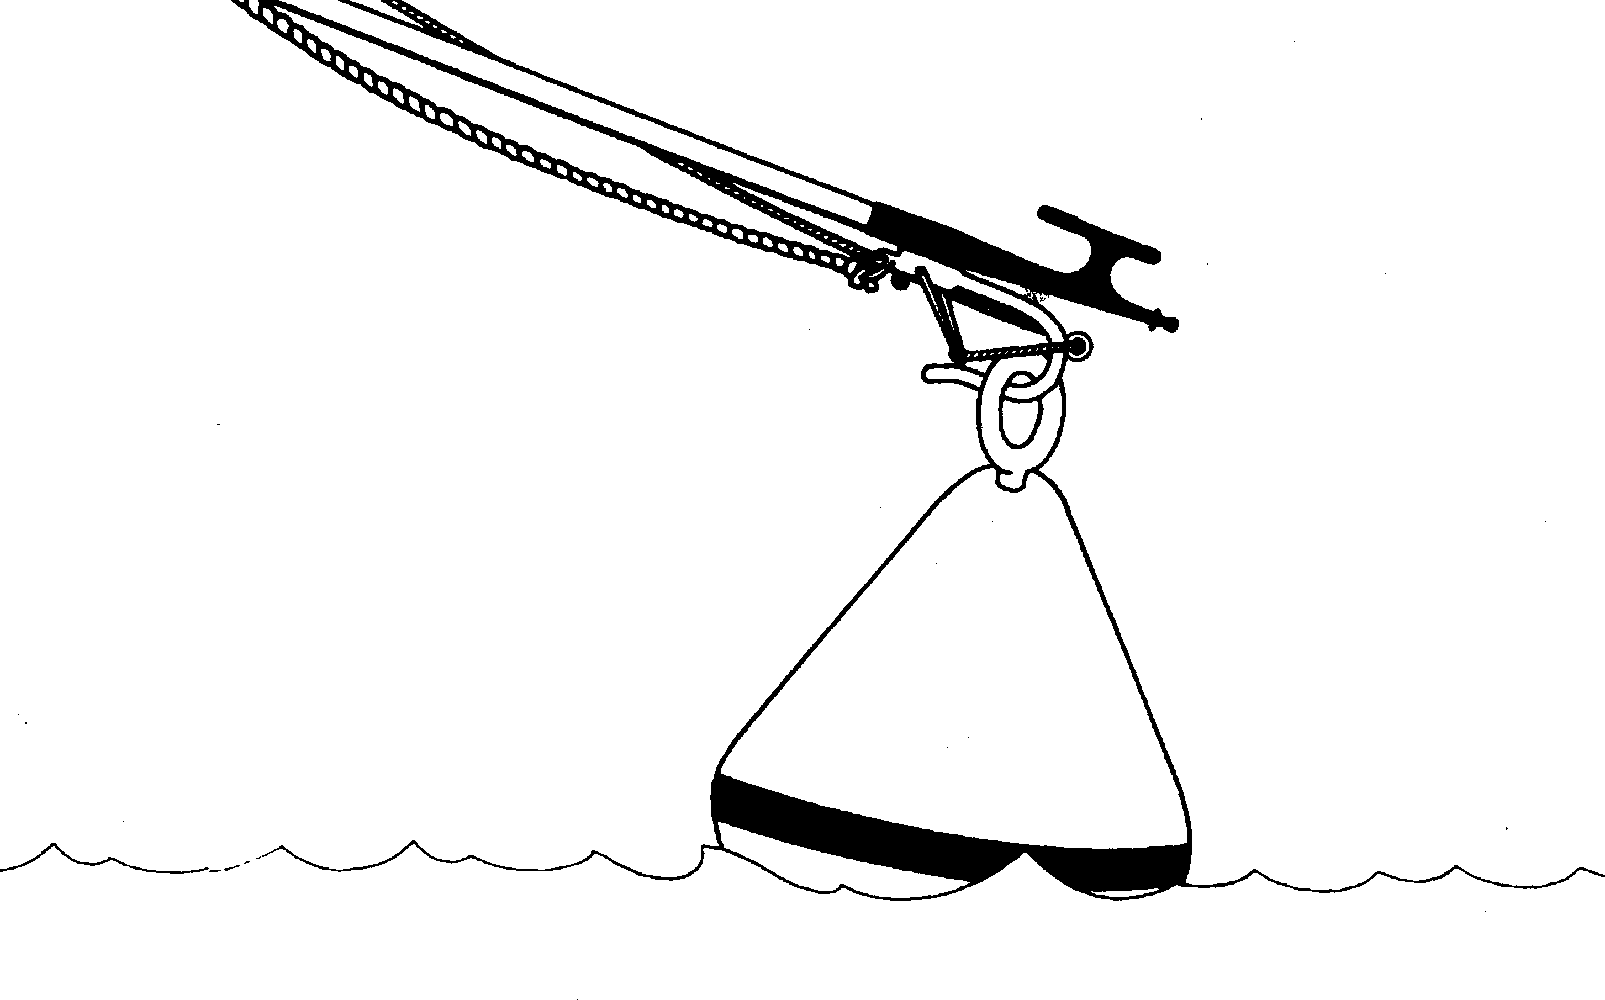 Mooring Buoy Amp Retrieving Hook Swi Tec De